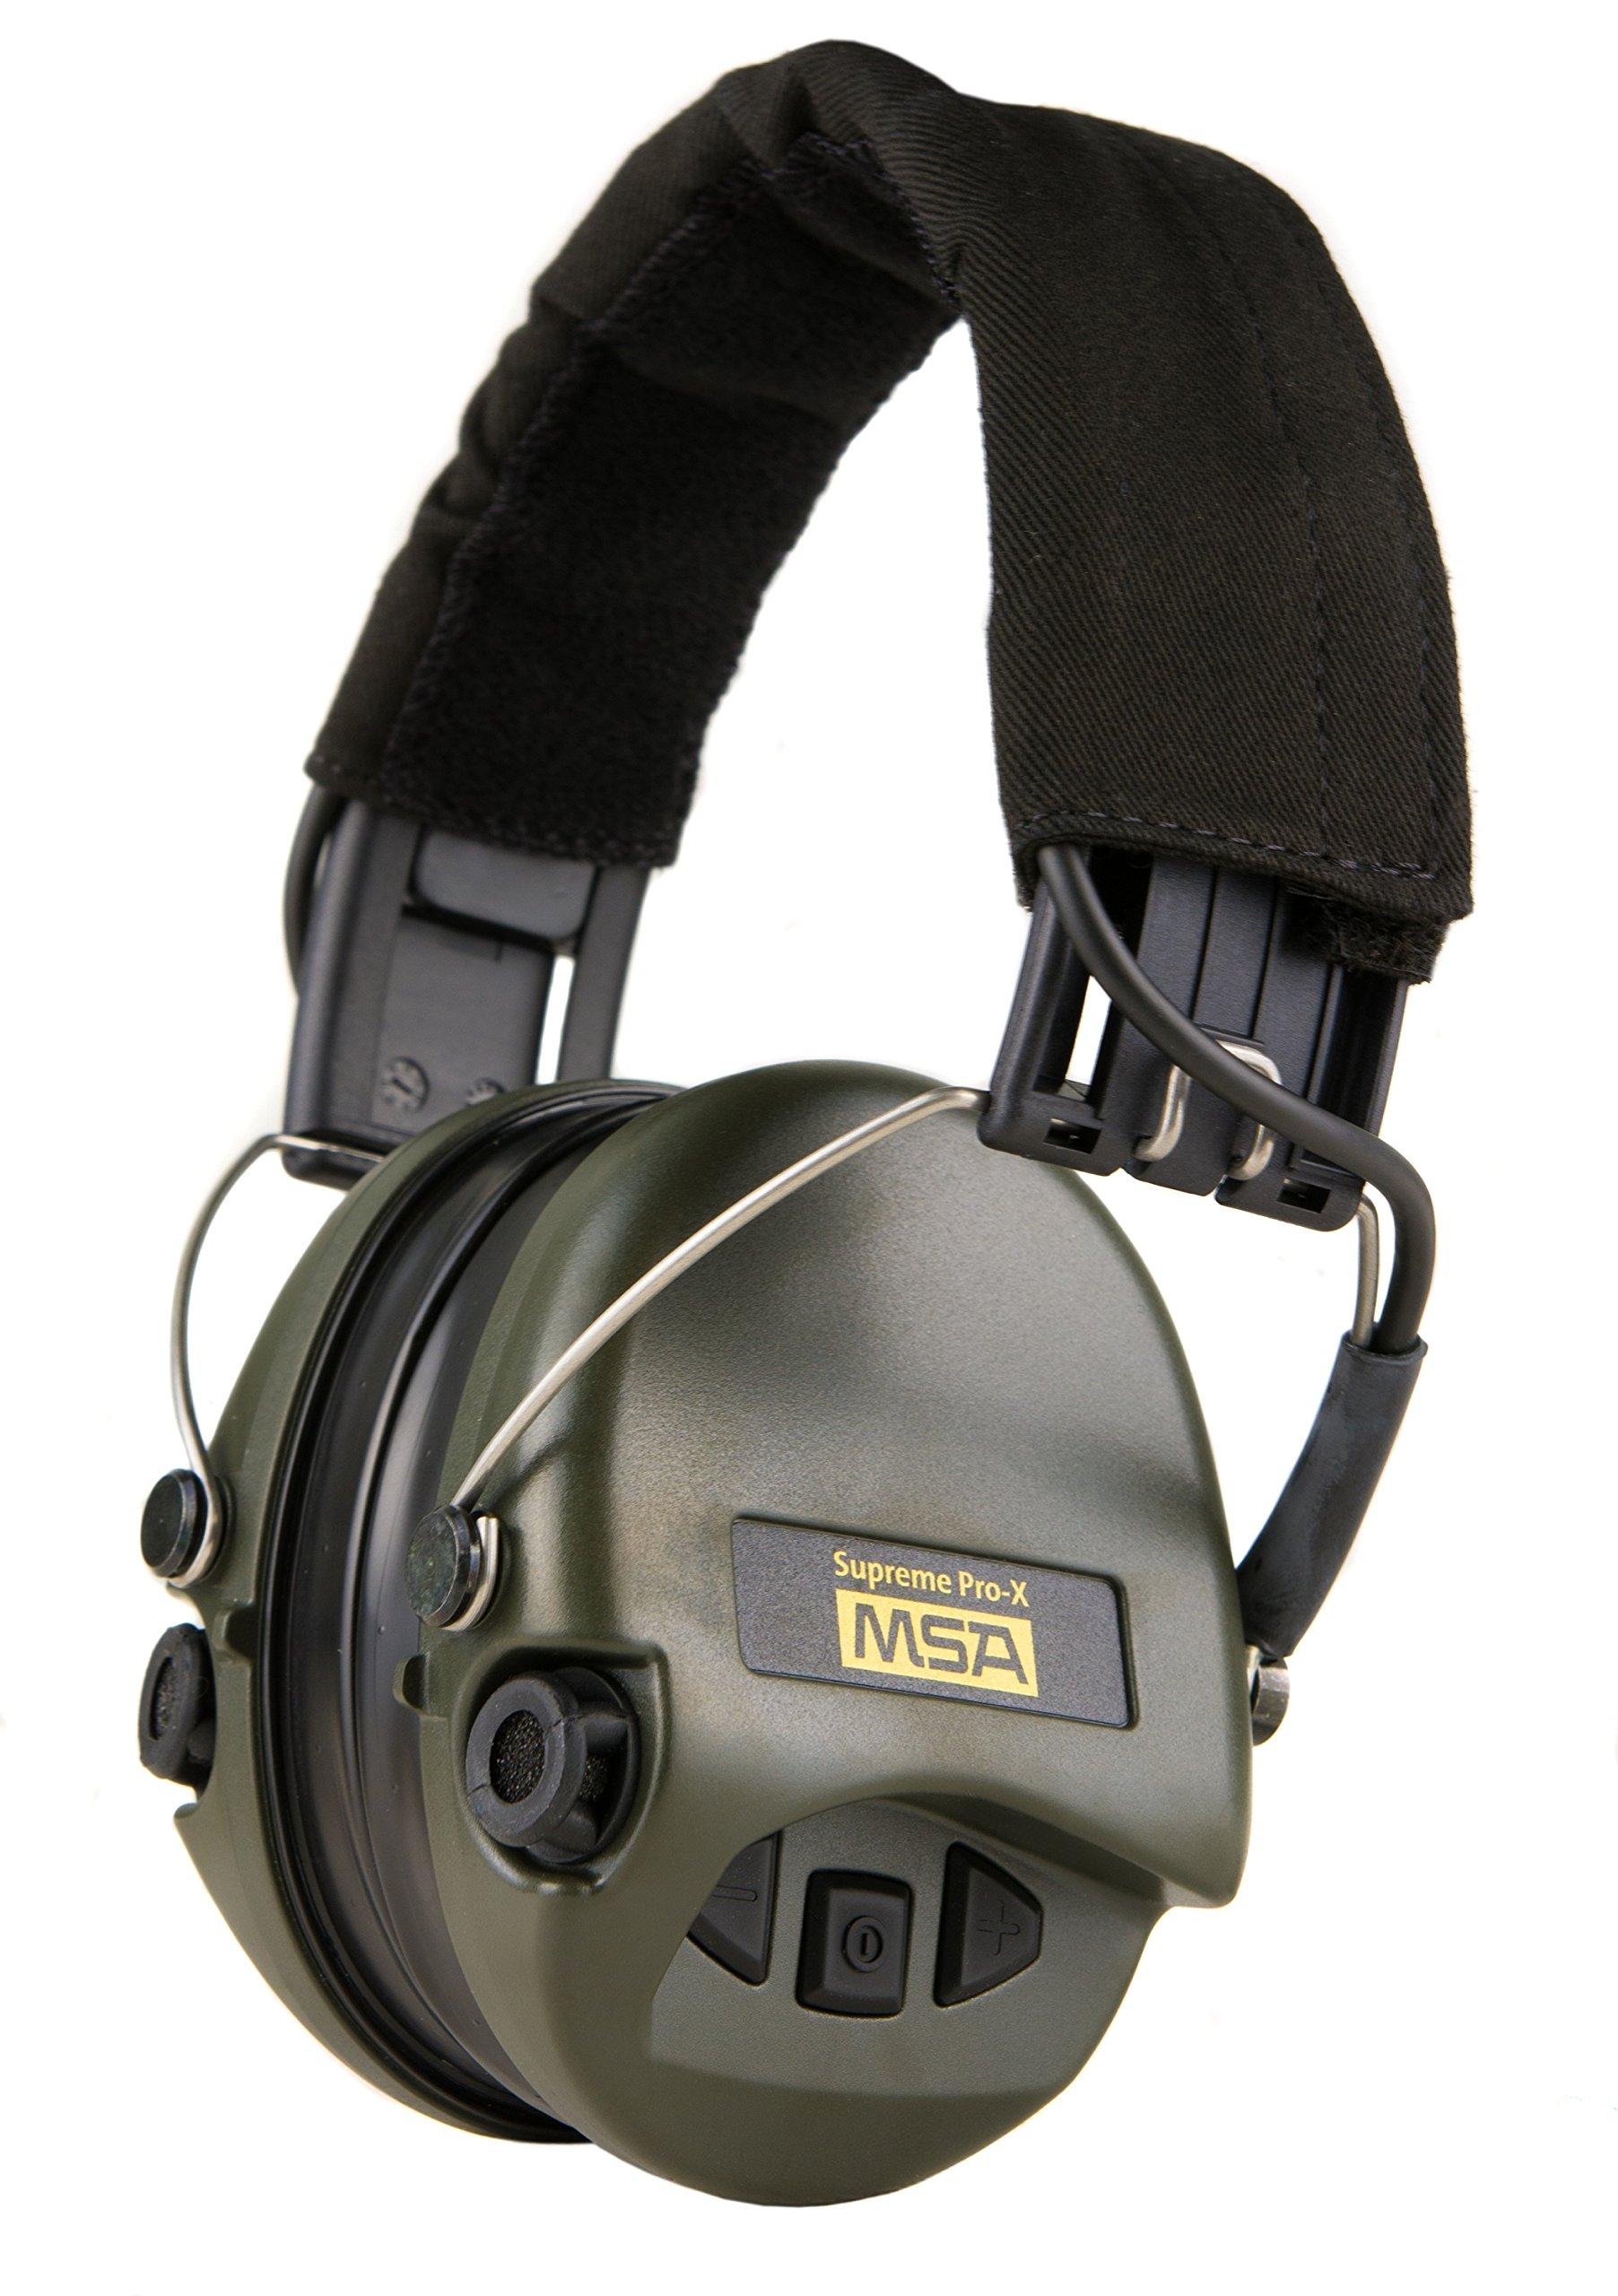 MSA Sordin Supreme PRO X - Digital Electronic Earmuff Amplification AUX-Input Black-Green Gel-Seals